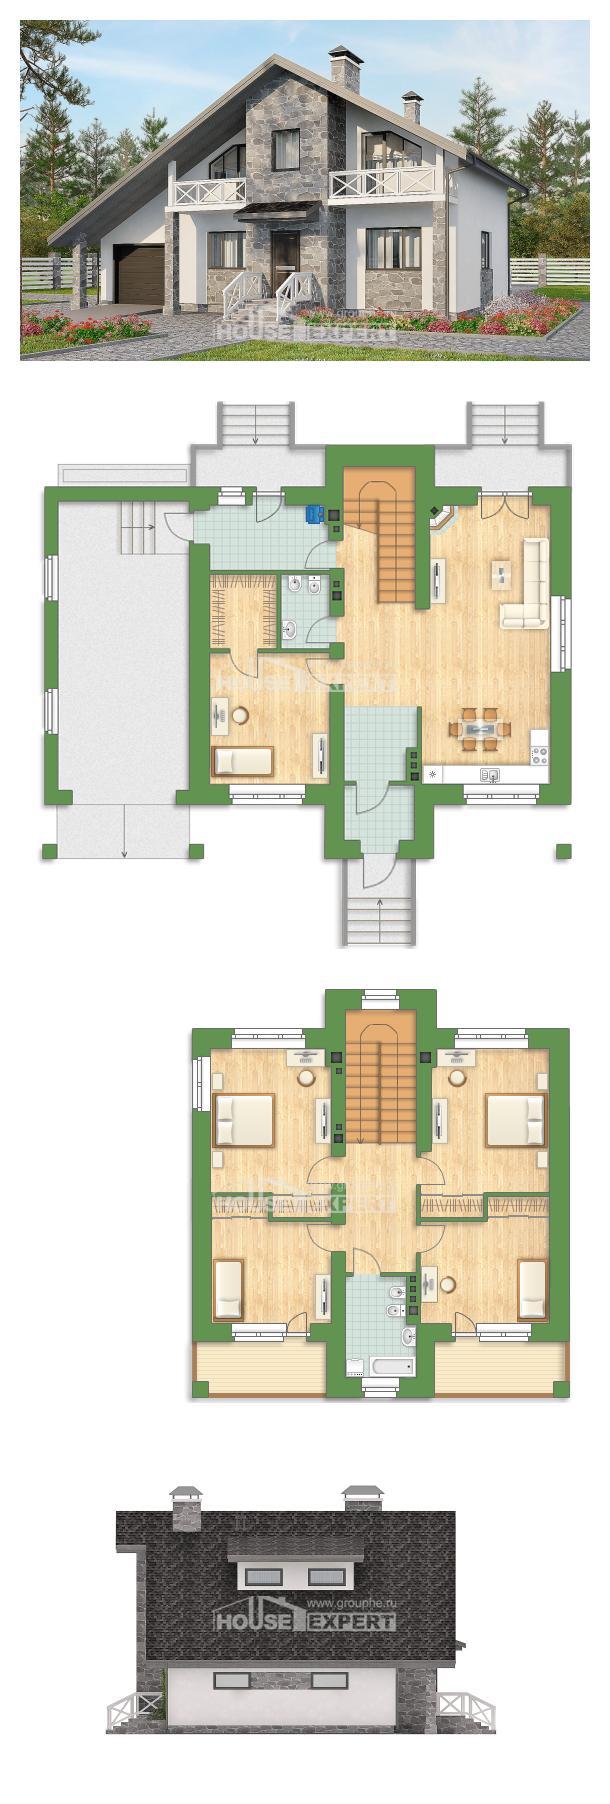 Ev villa projesi 180-017-L   House Expert